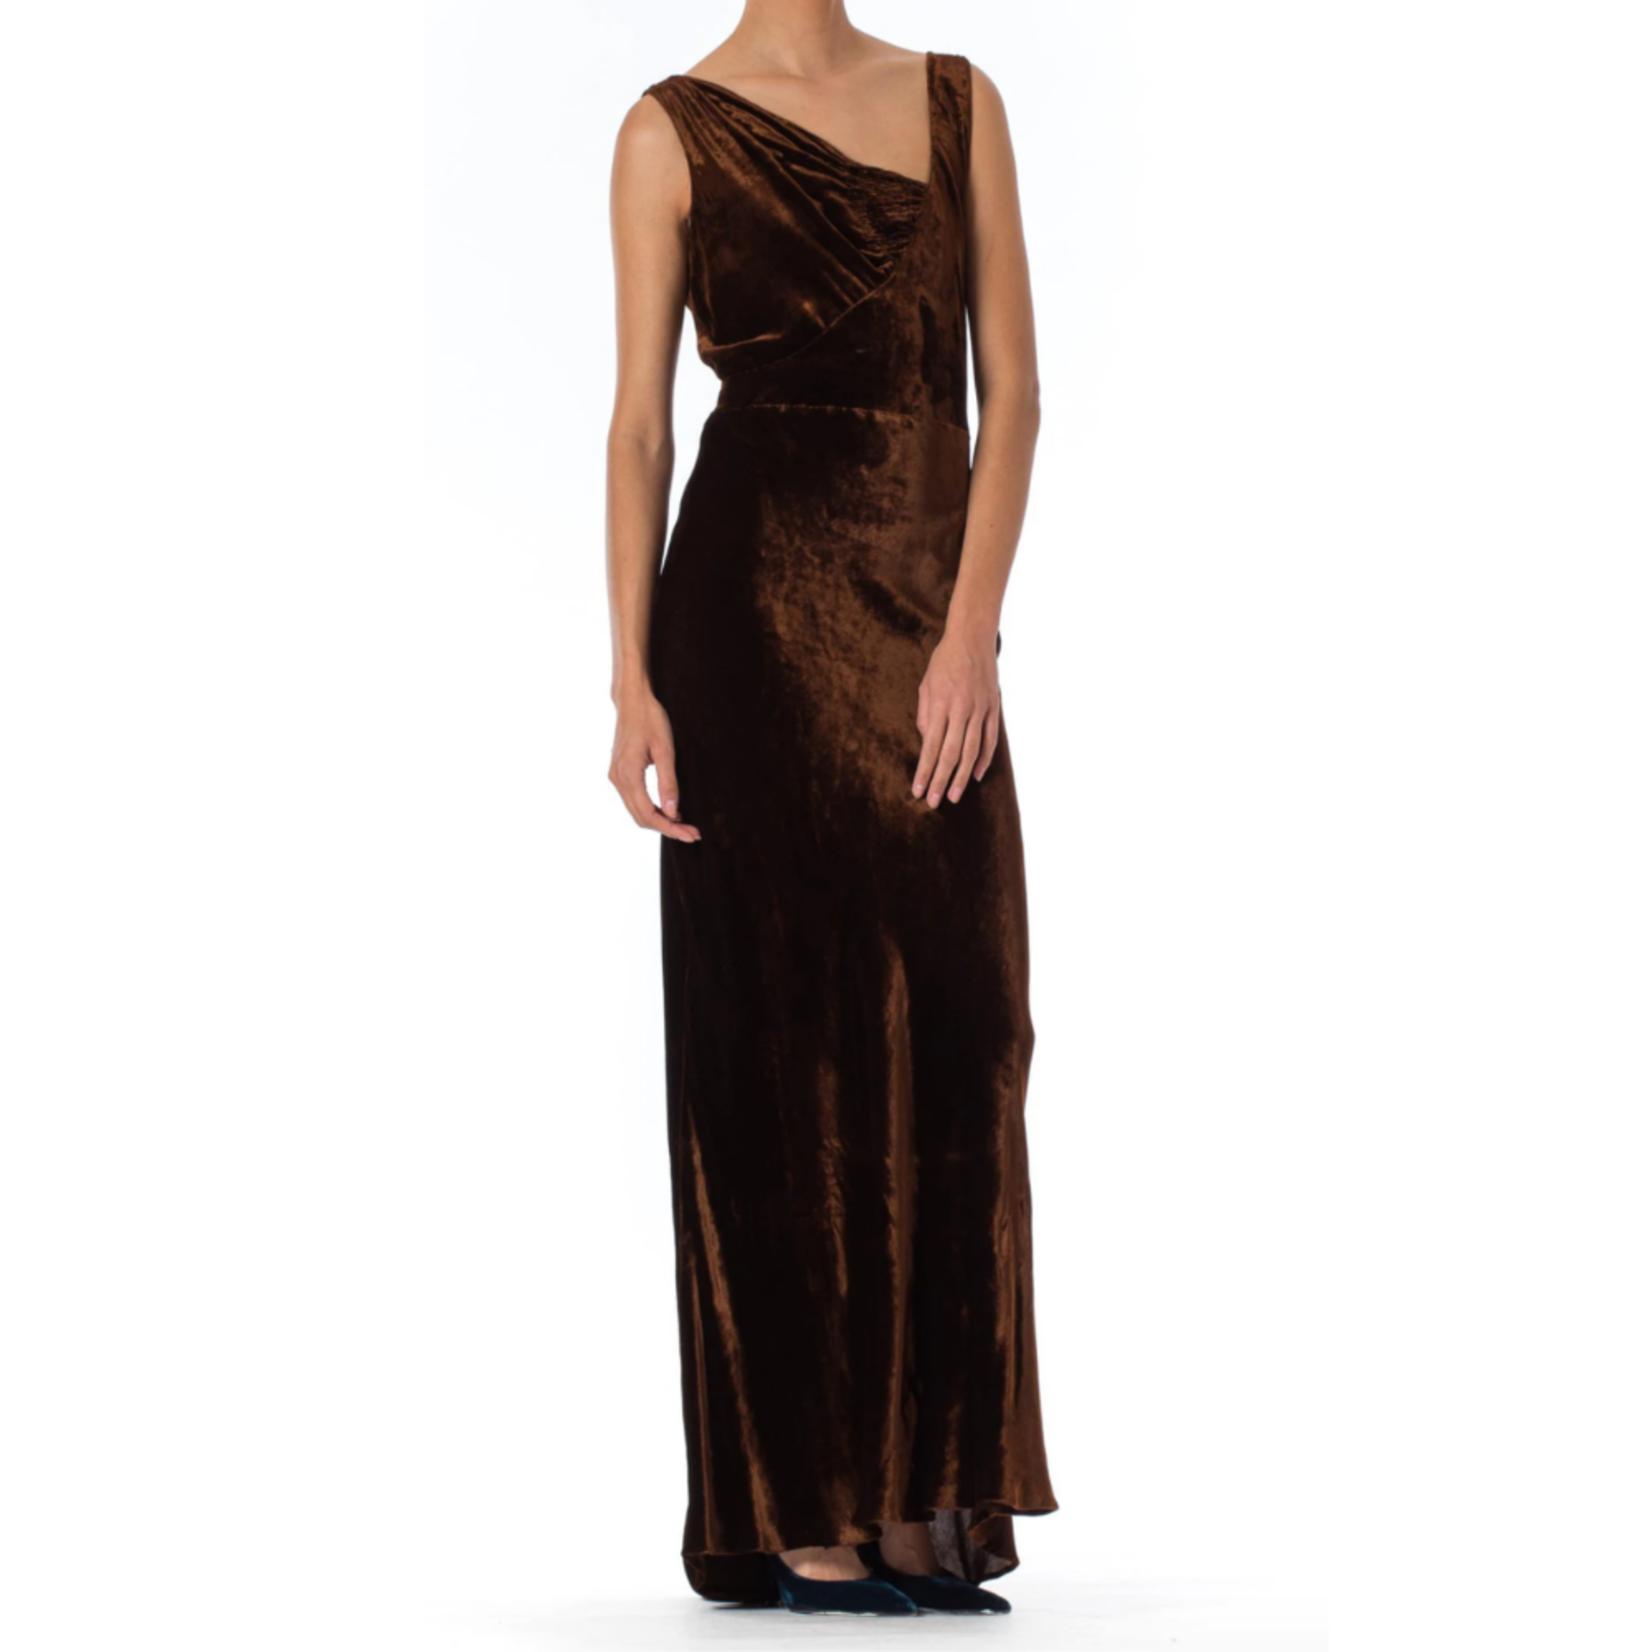 Morphew 1930s Harrods Chocolate Brown Asymmetrically Draped Bias Silk Velvet Gown